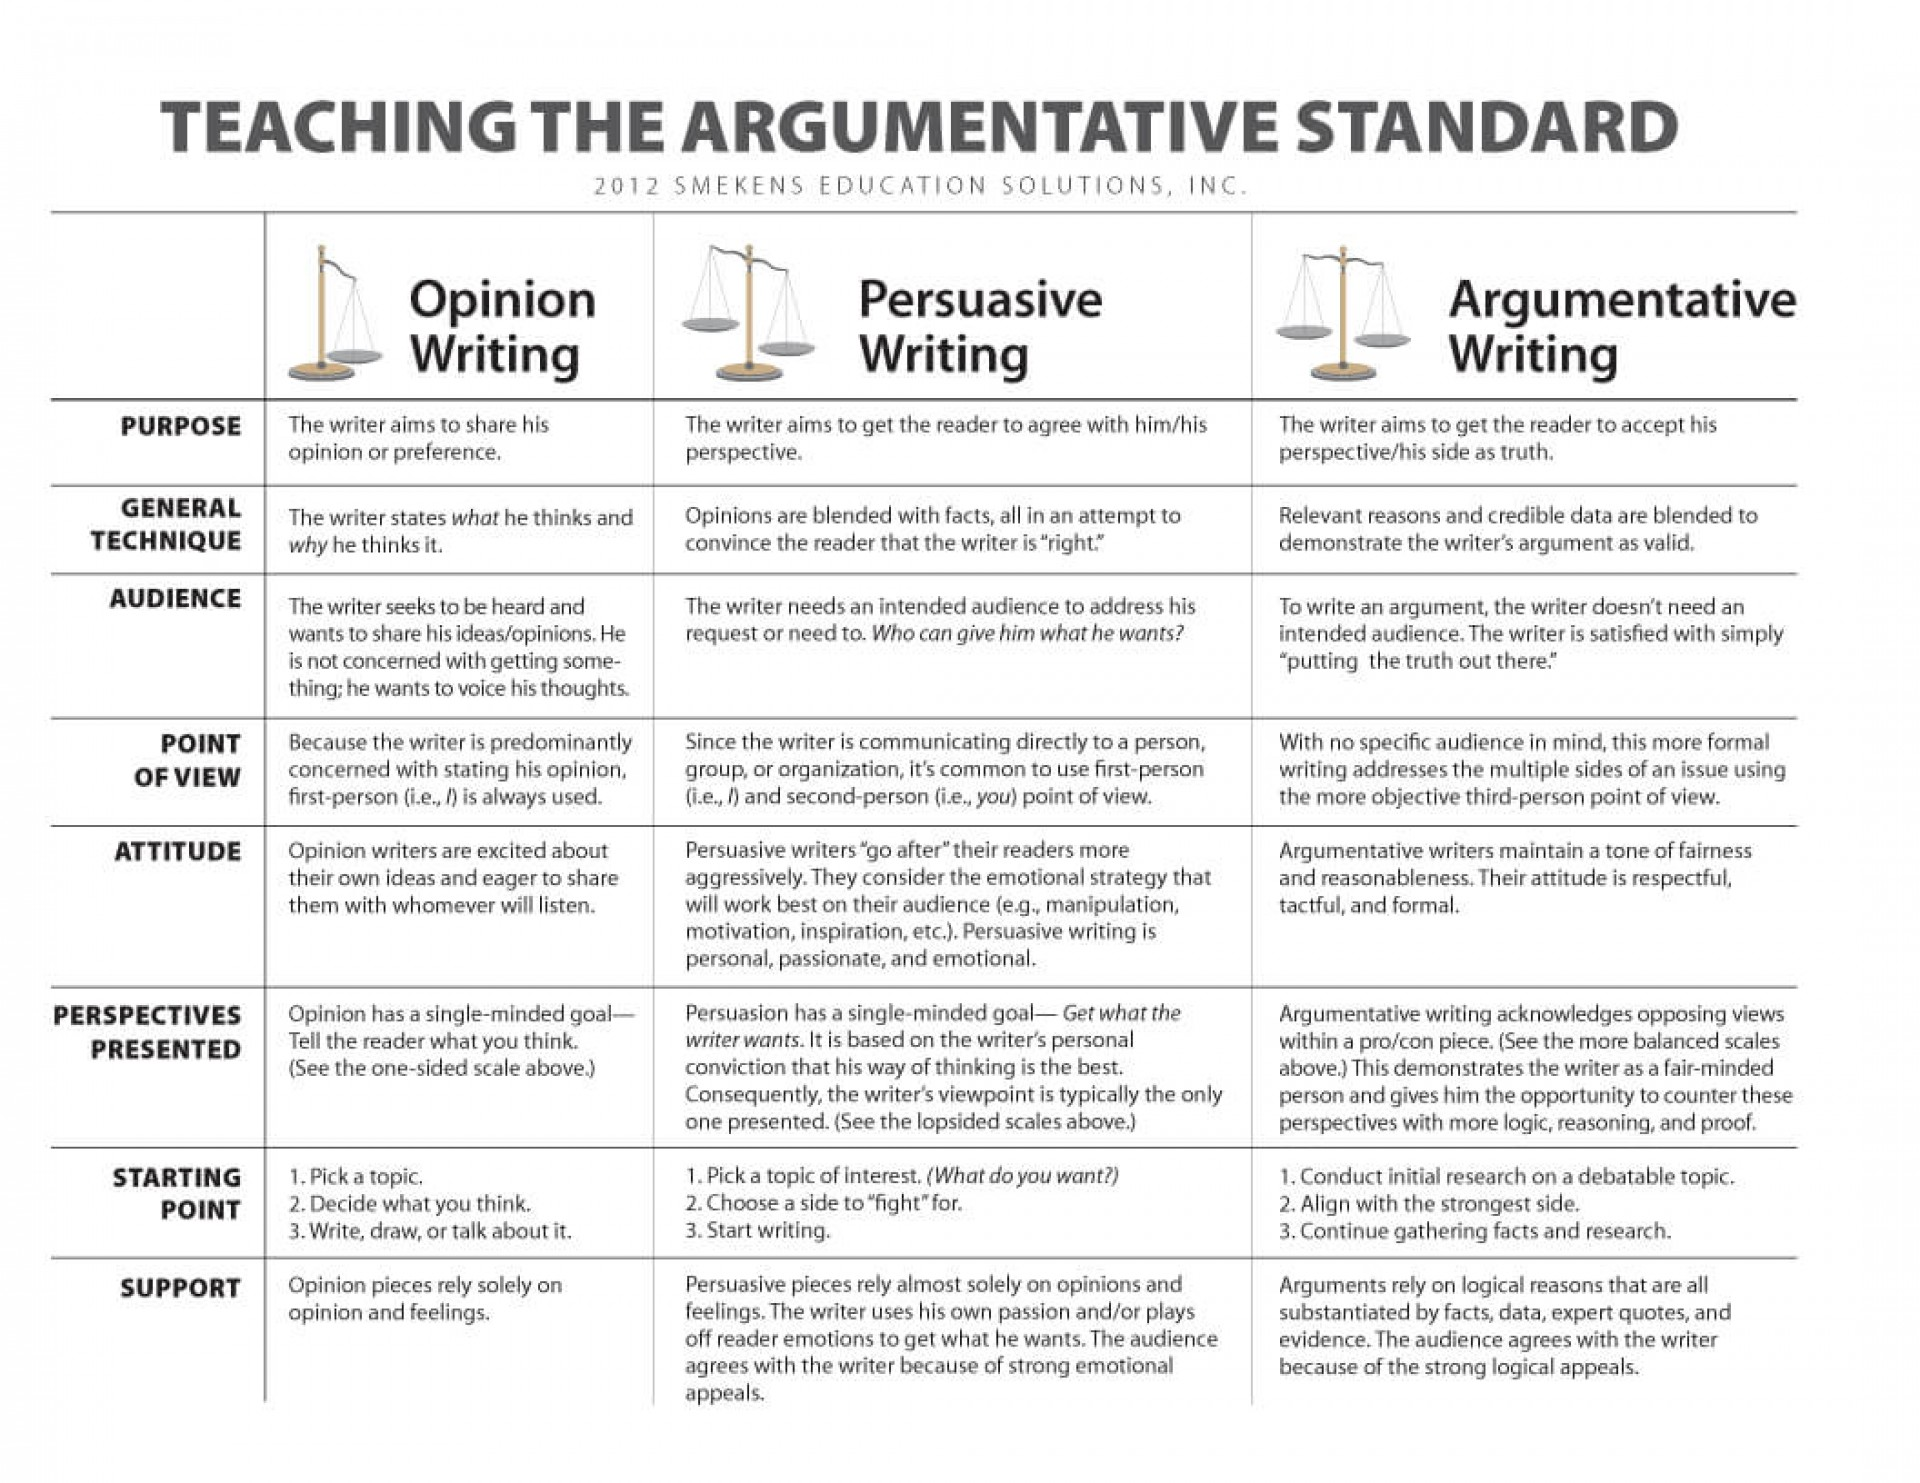 010 Teaching The Argumetative Standardo Essay Example Parts Of Imposing 6 A Persuasive 1920